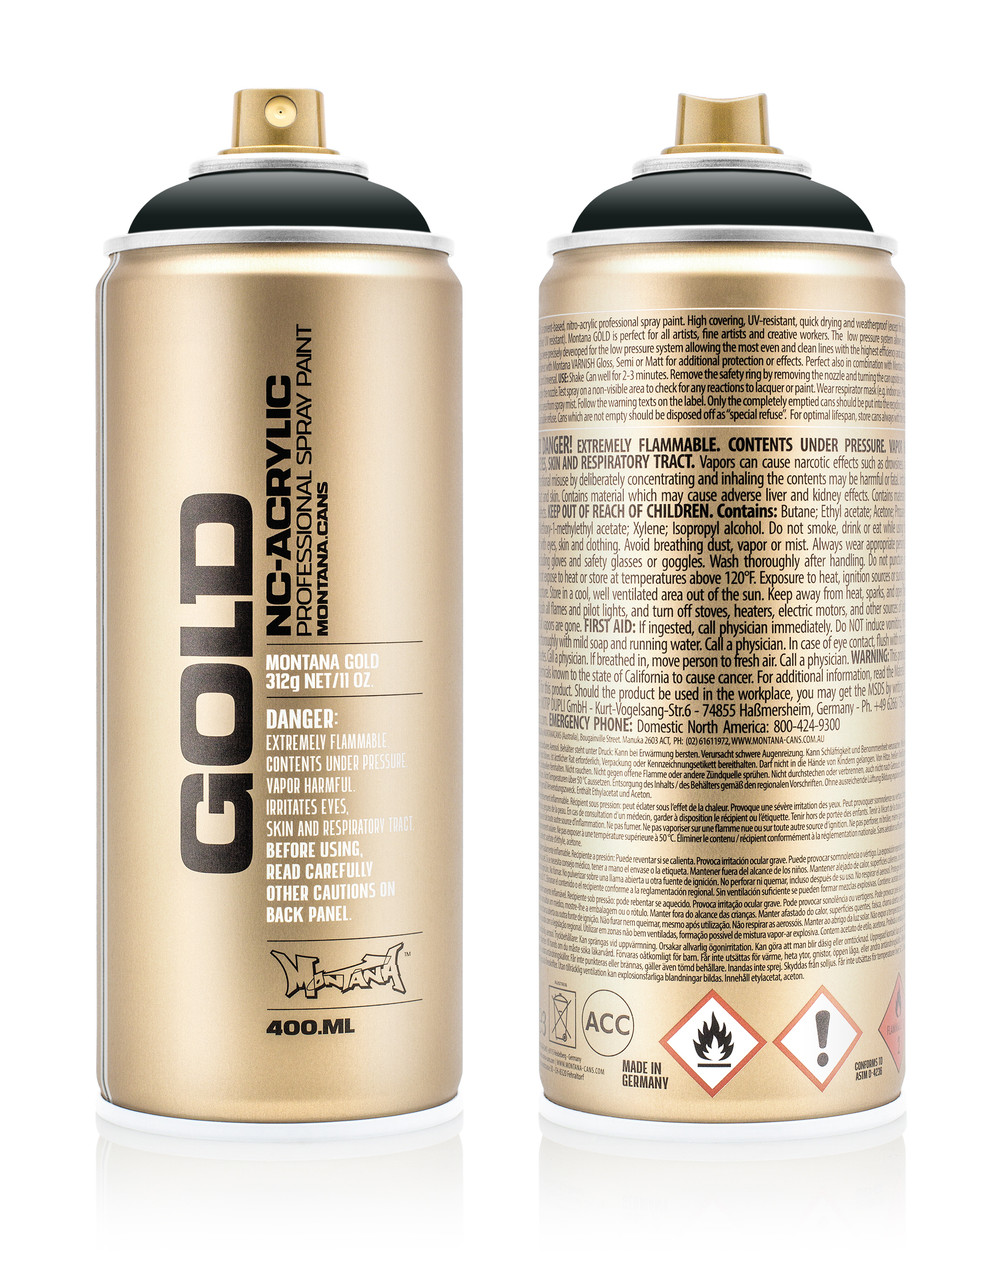 Краска Montana Gold 8145 Антрацит 400 мл (Anthracite) (285509)